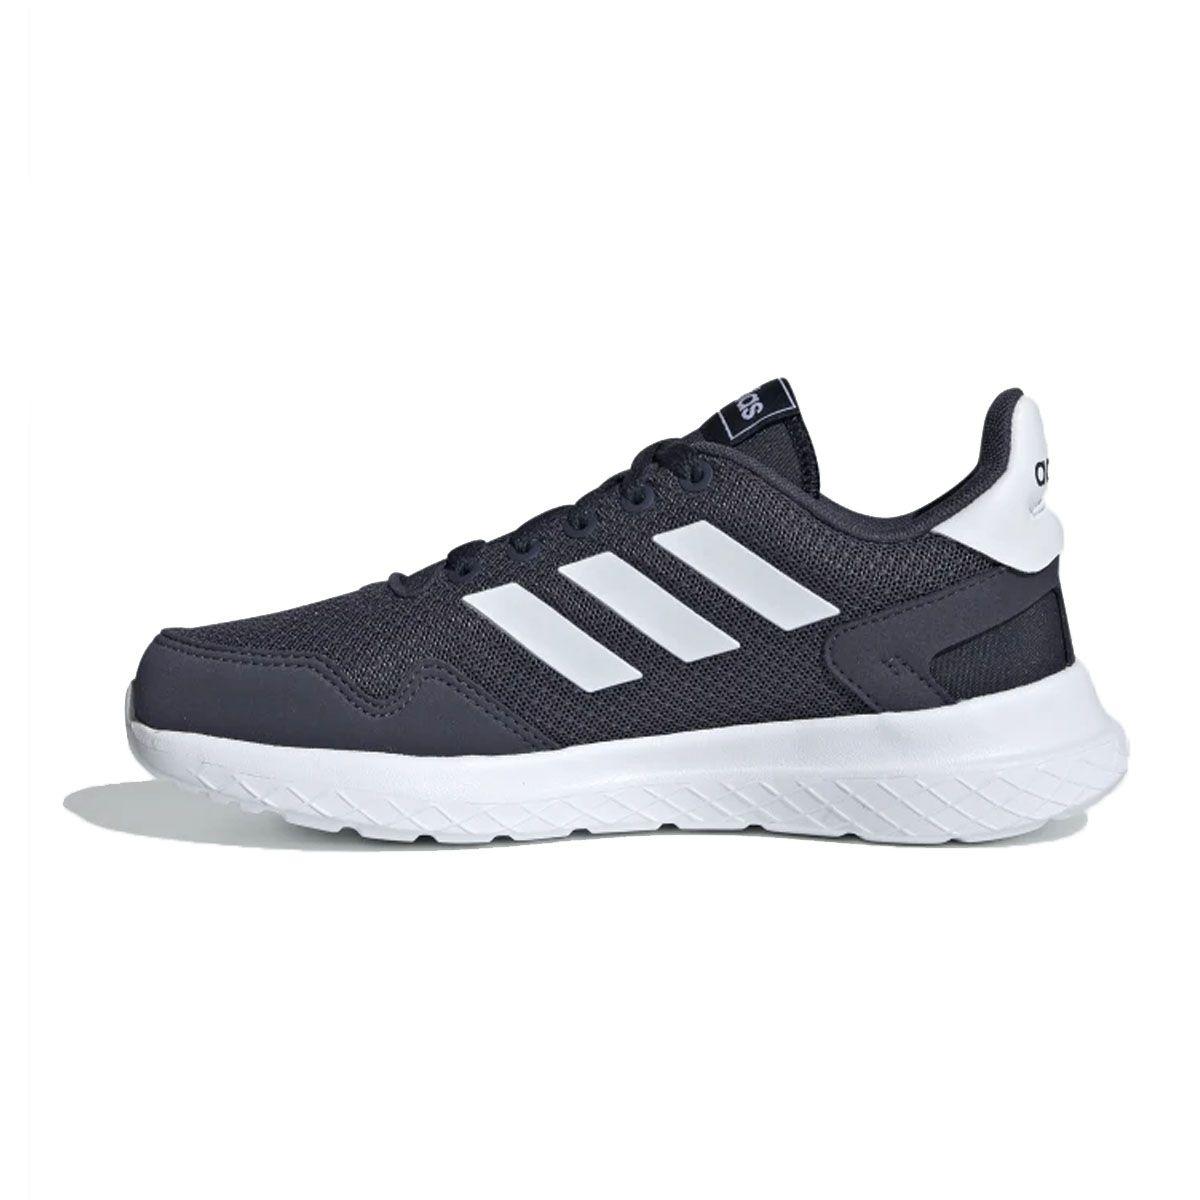 Tênis Adidas Wish Archivo Infantil